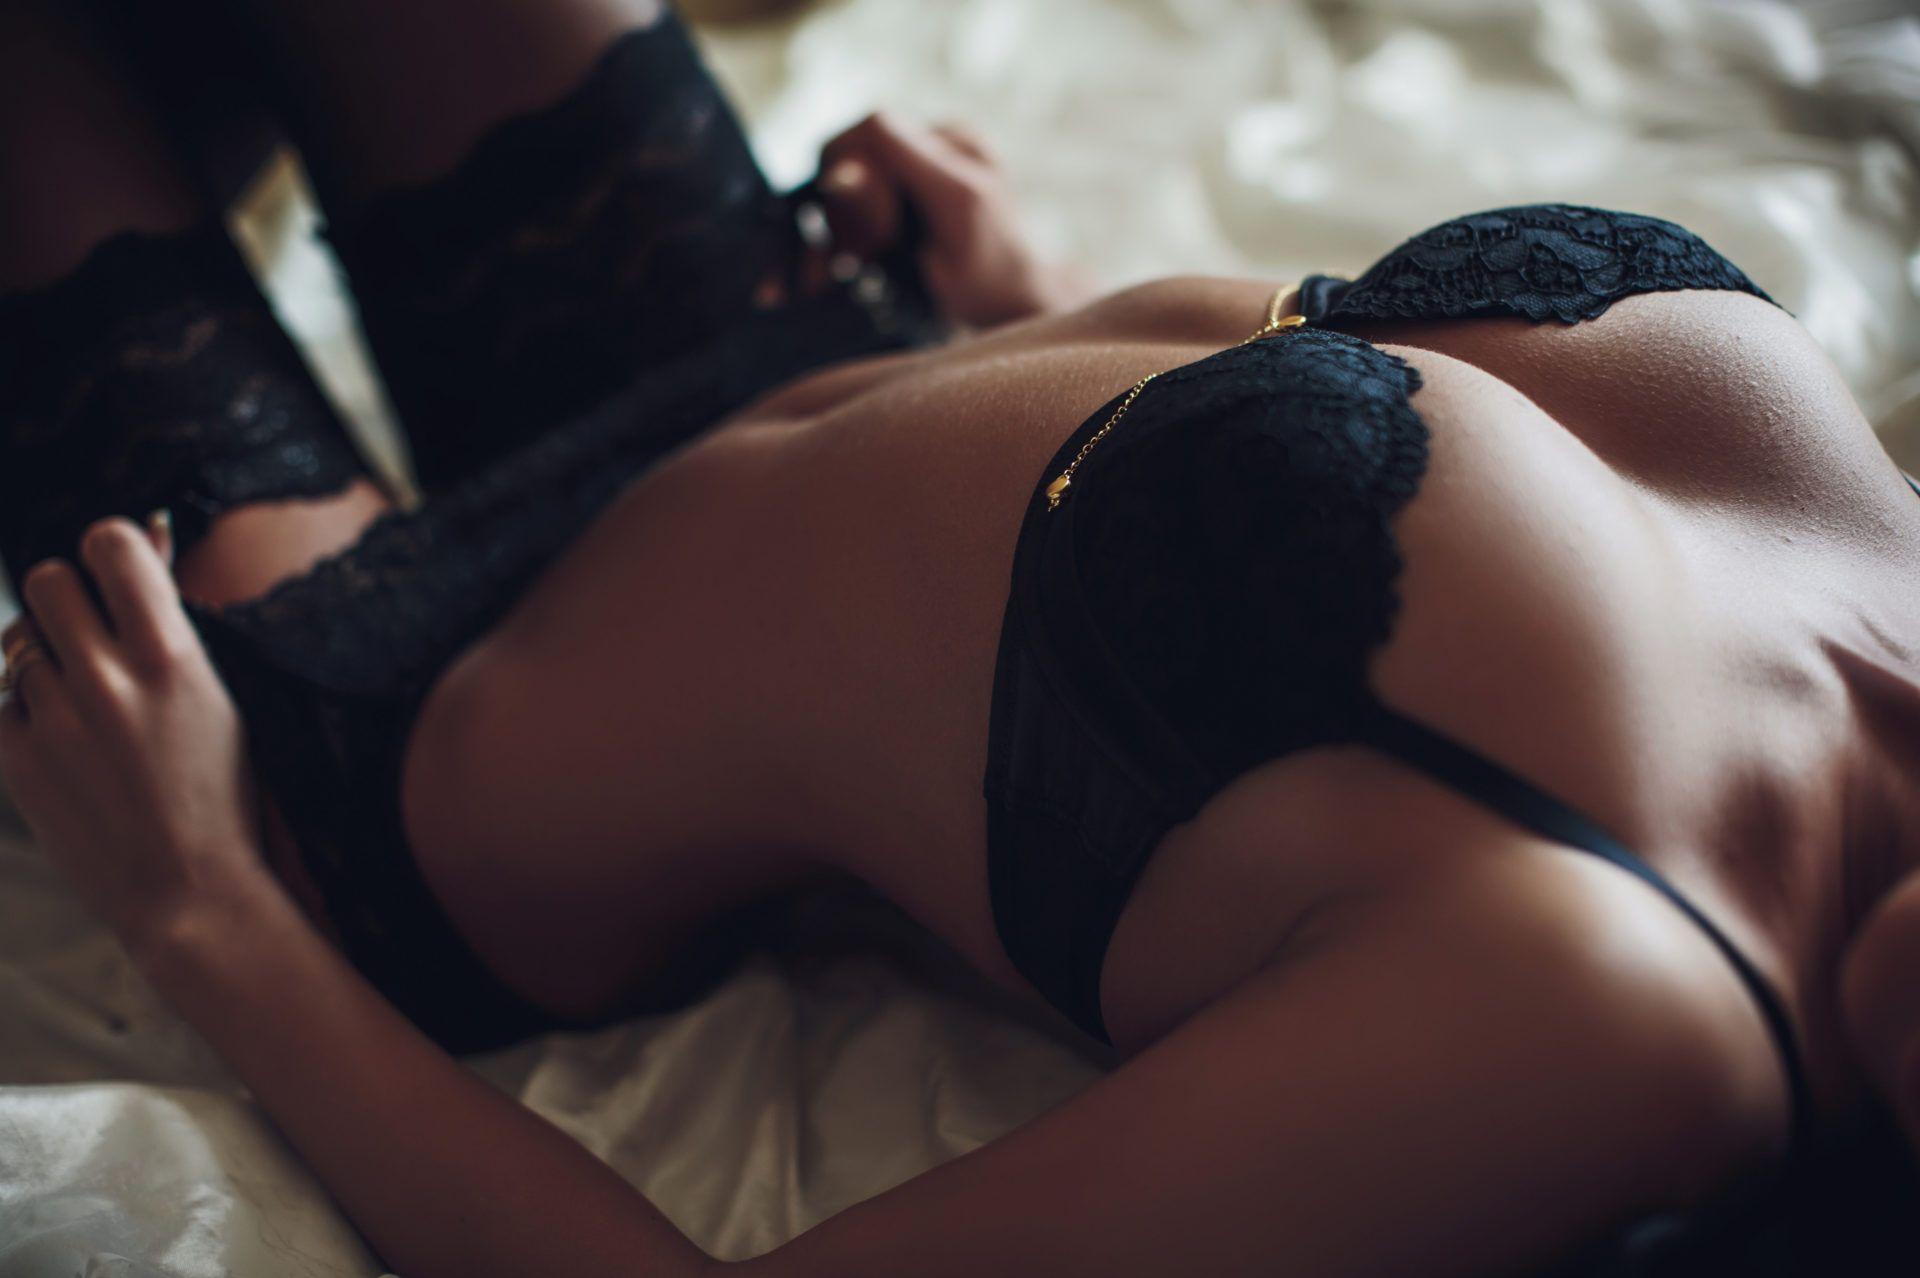 escort quitandose la ropa